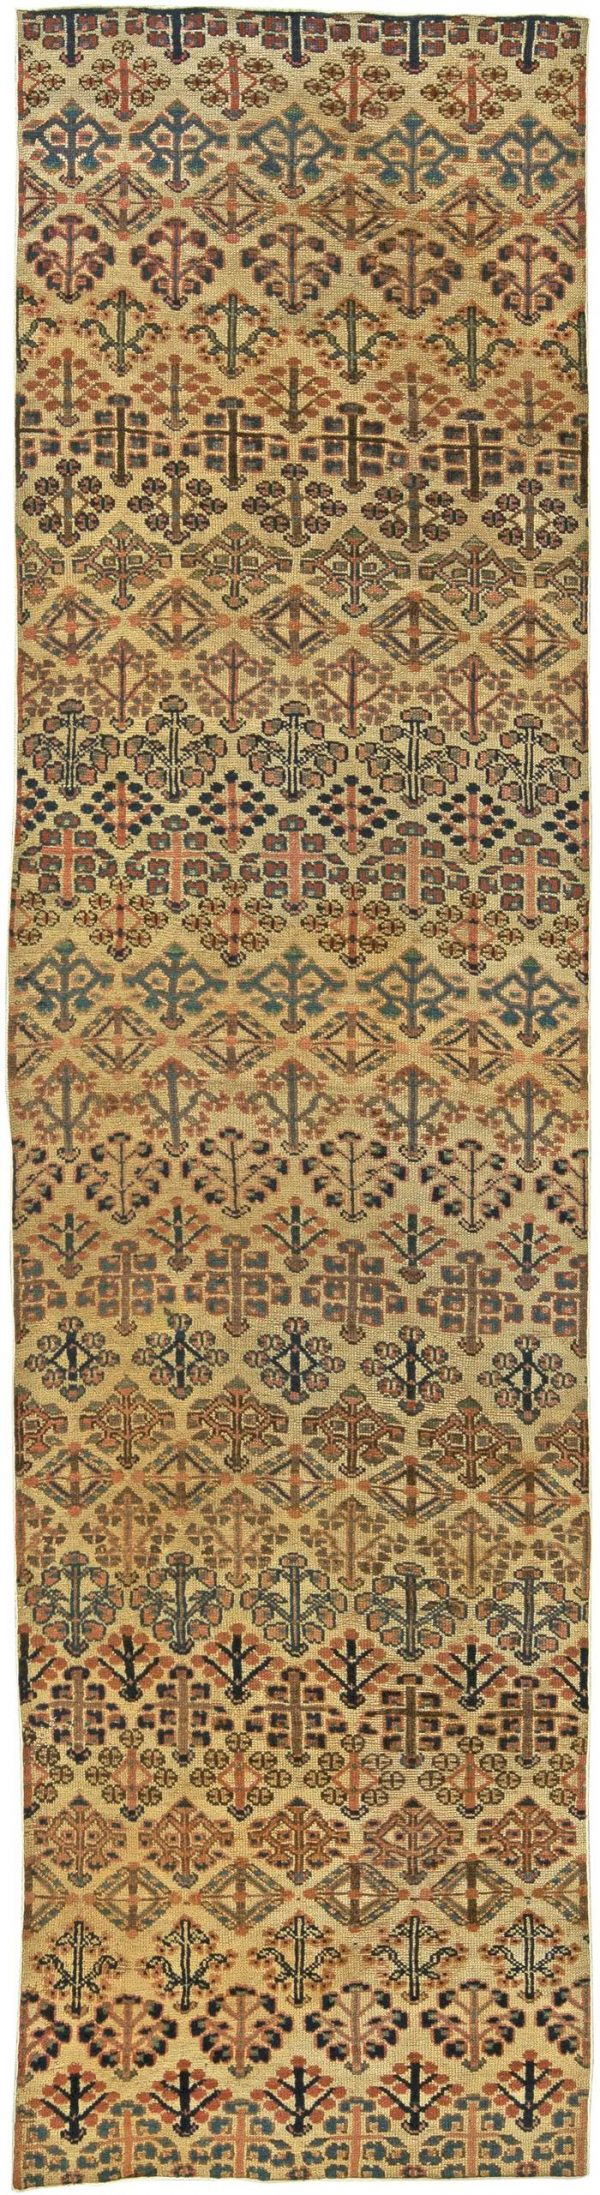 Antique Persian Hamadan Rug (Size adjusted) BB5822